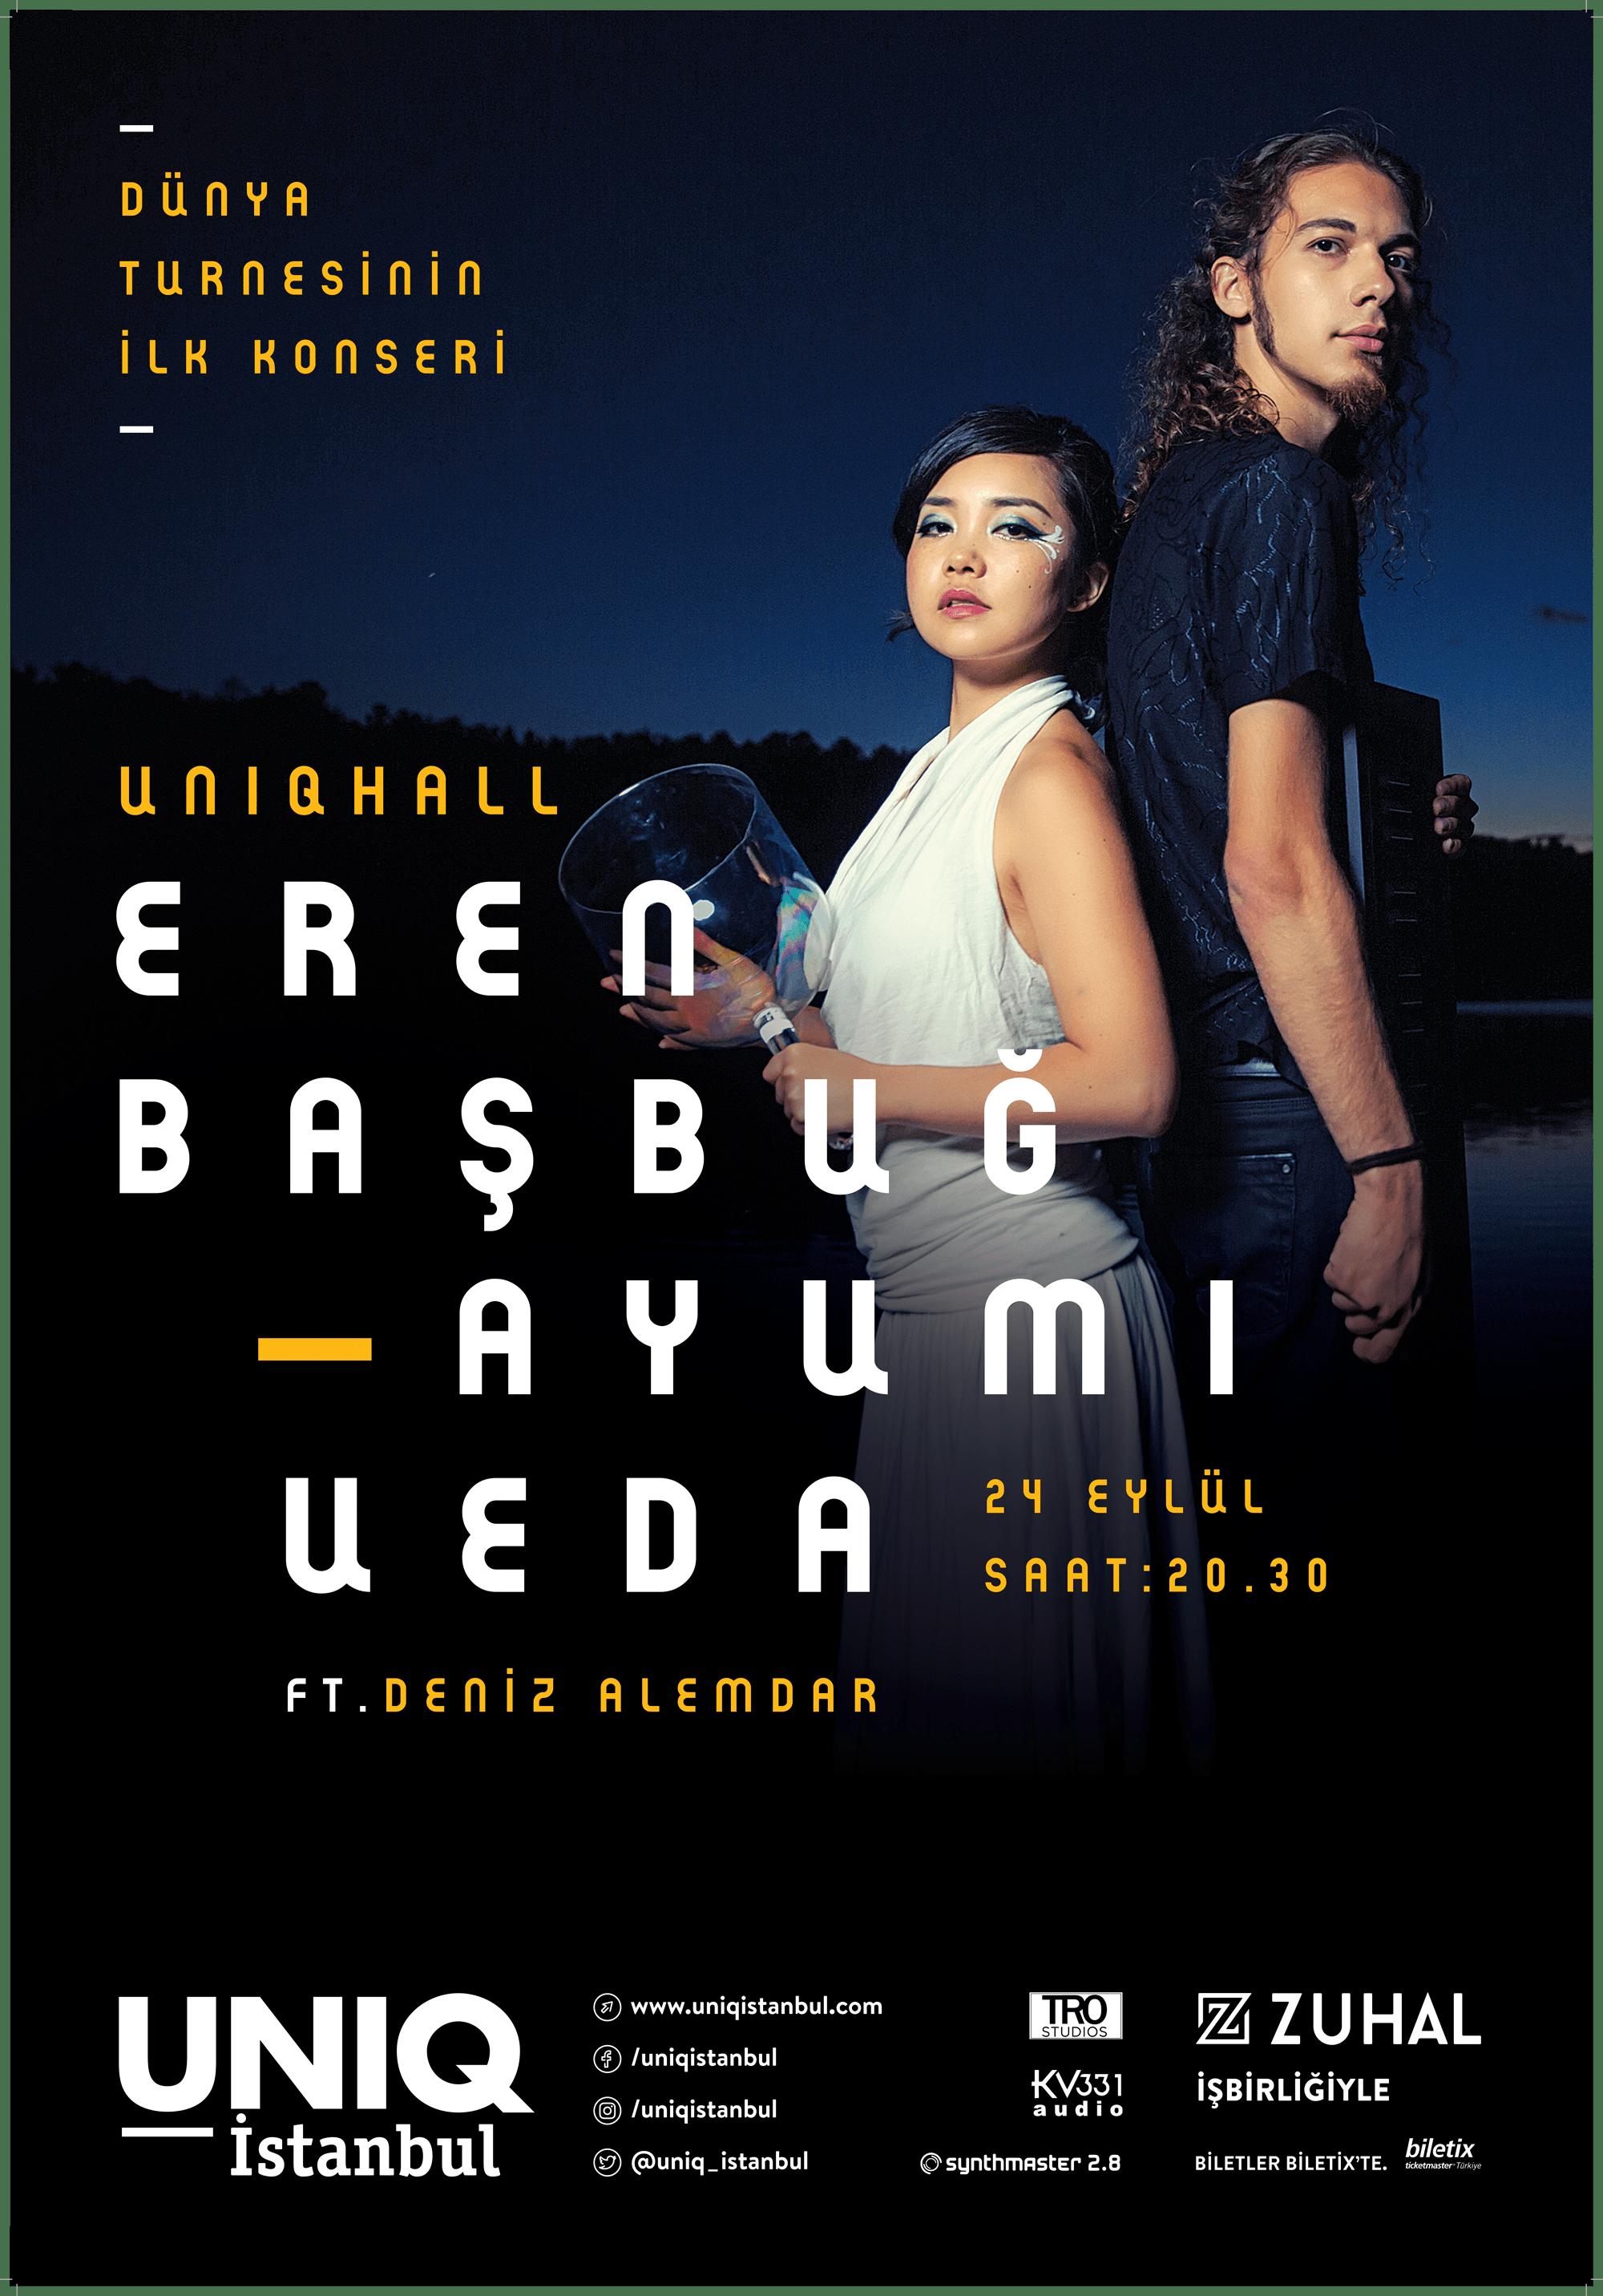 Eren-basbug-ayumi-ueda-poster